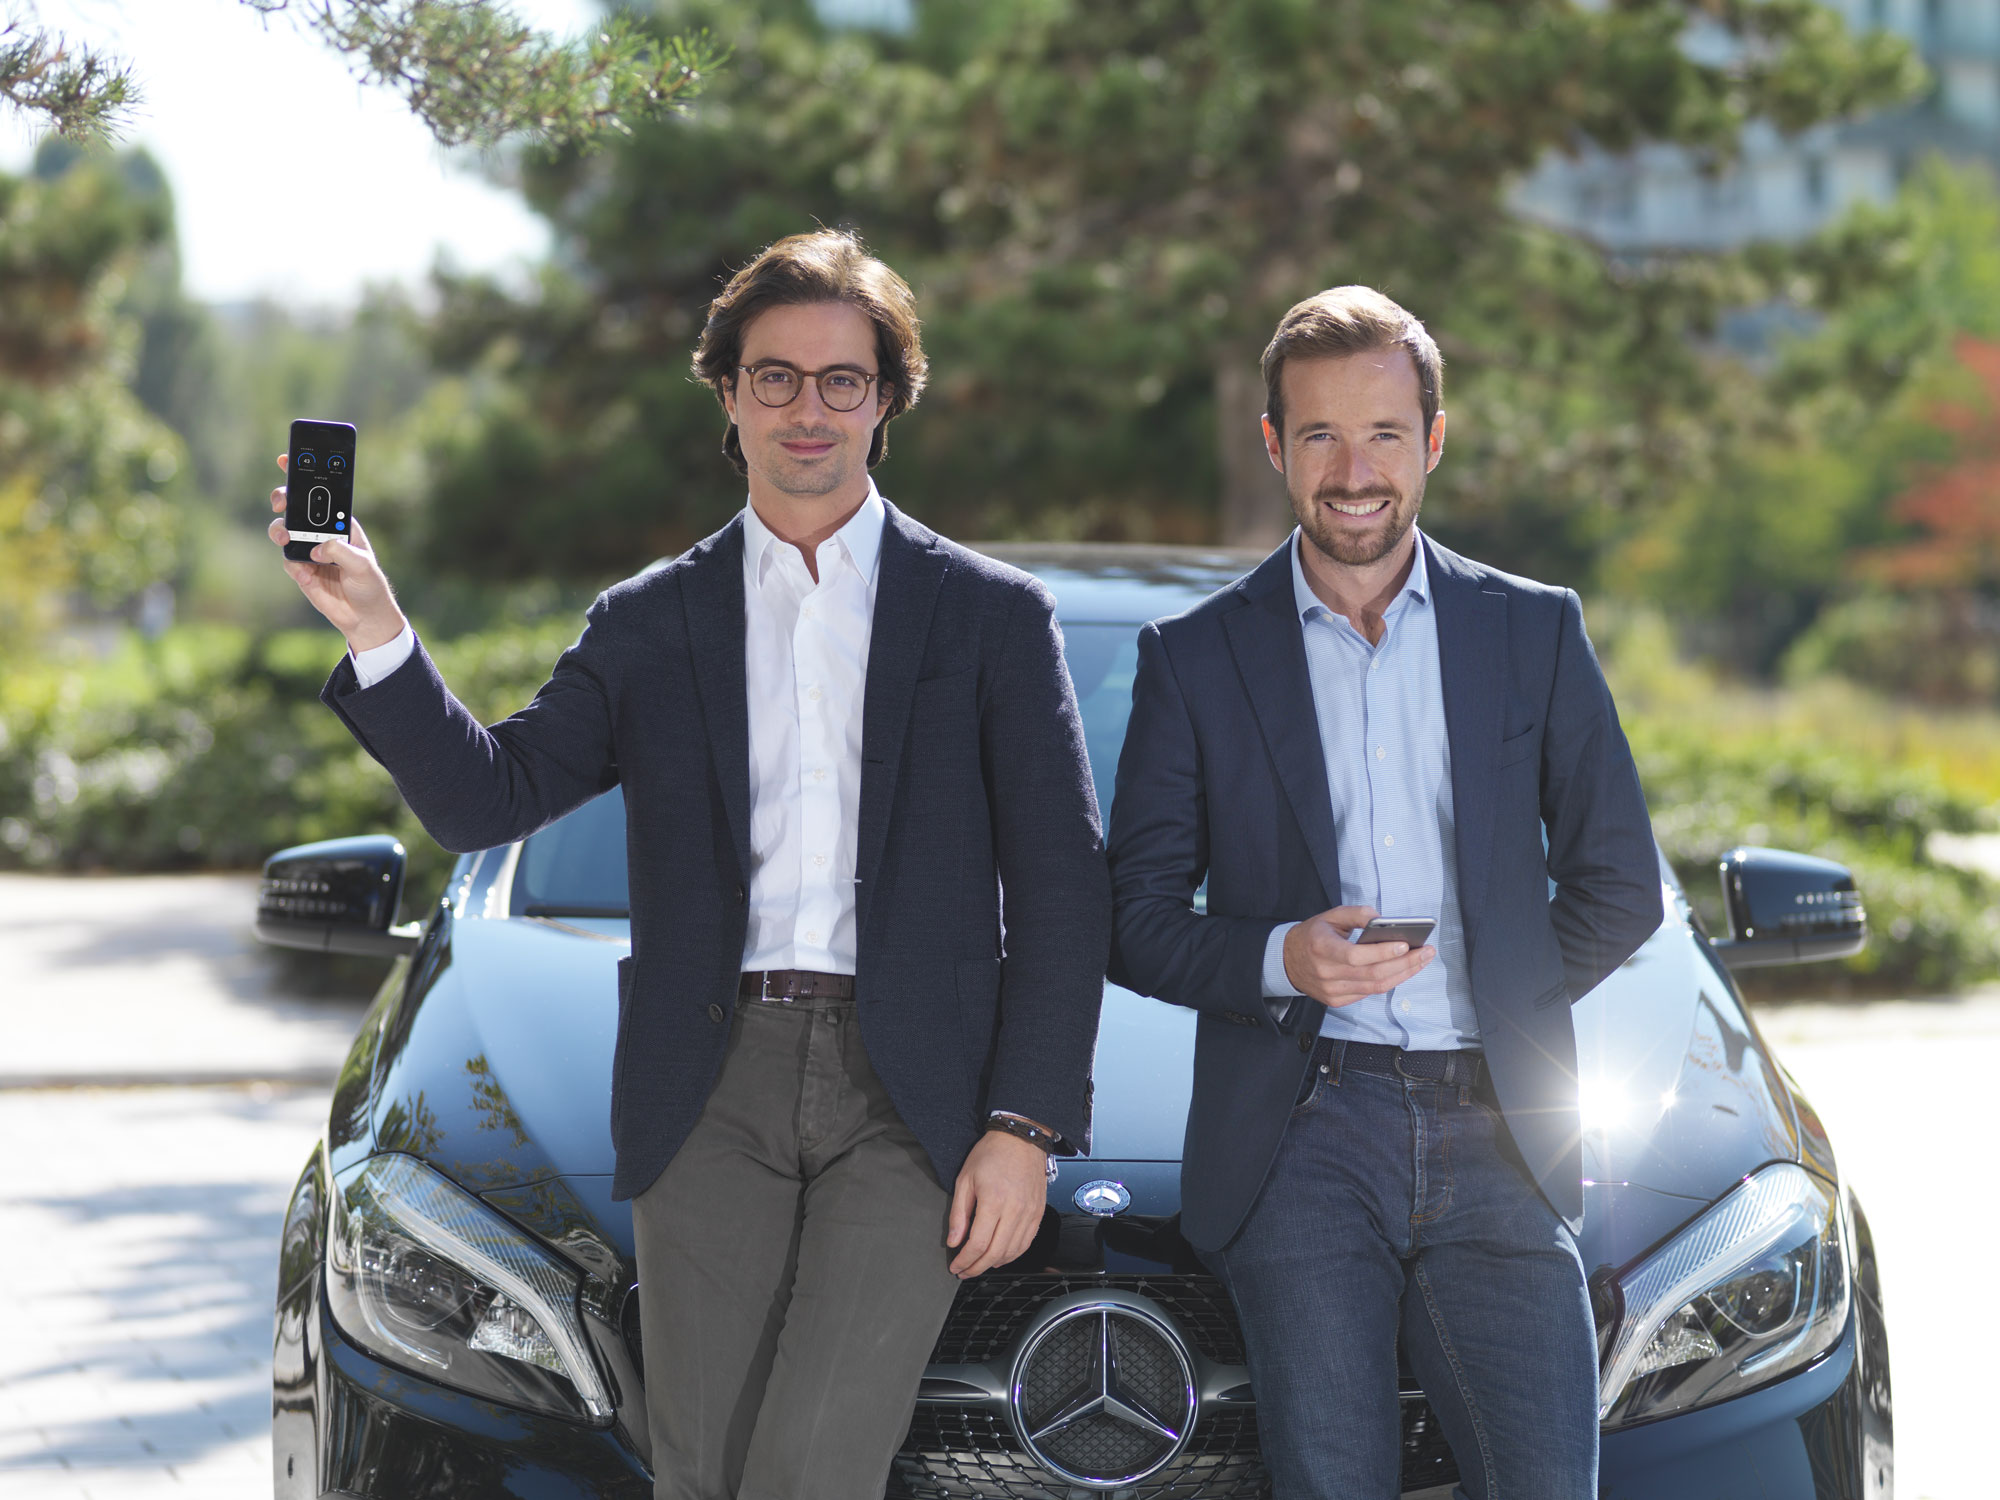 Karim Kaddoura and Thibault Chassagne, founders of Virtuo.